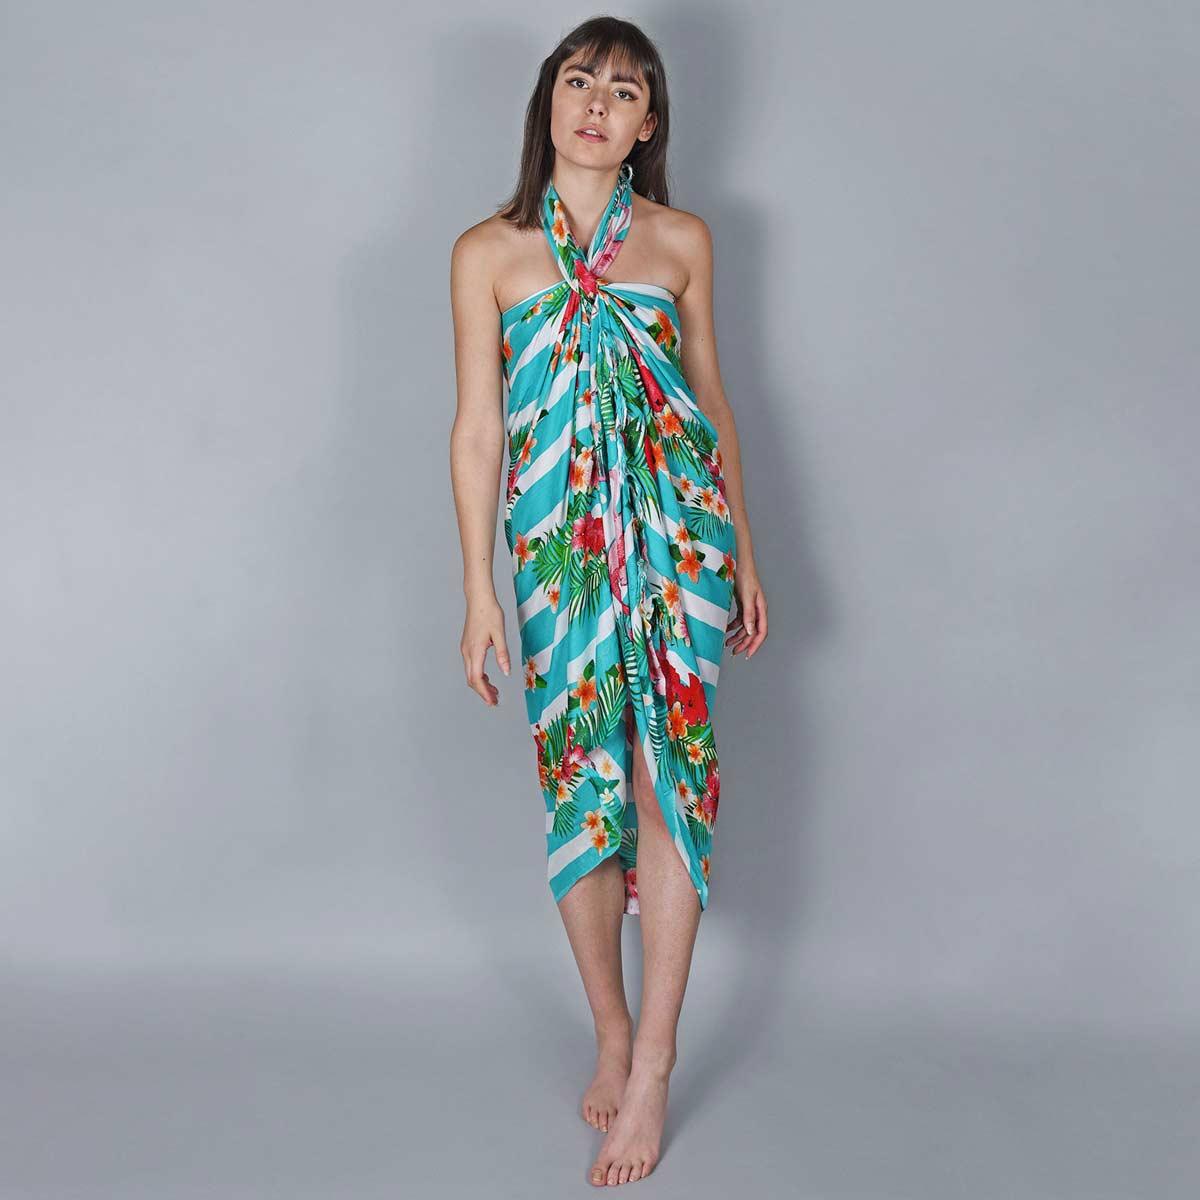 AT-06077_W12-2--_Pareo-femme-rayures-vertes-flamingo